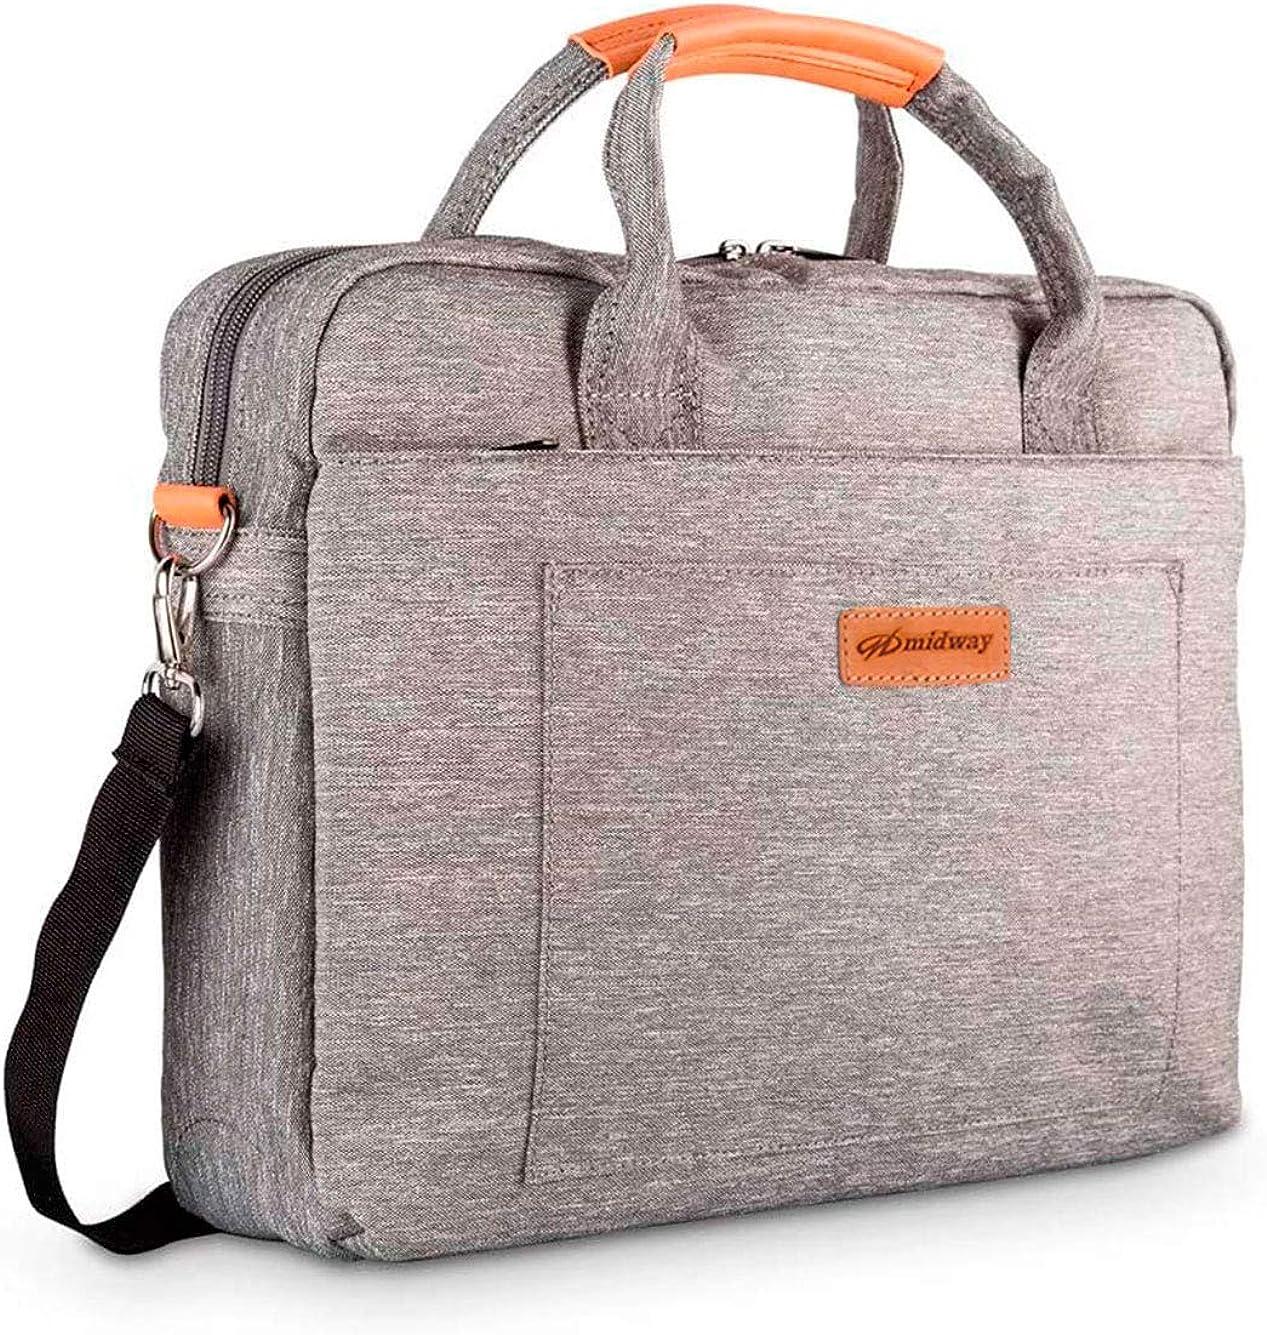 Slim Laptop Briefcase 15.6 Inch Office College Shoulder Bag for Acer Aspire 1, Aspire 5, Aspire 7, Swift 5, Nitro 5, ConceptD 7, Chromebook 315 715, Predator